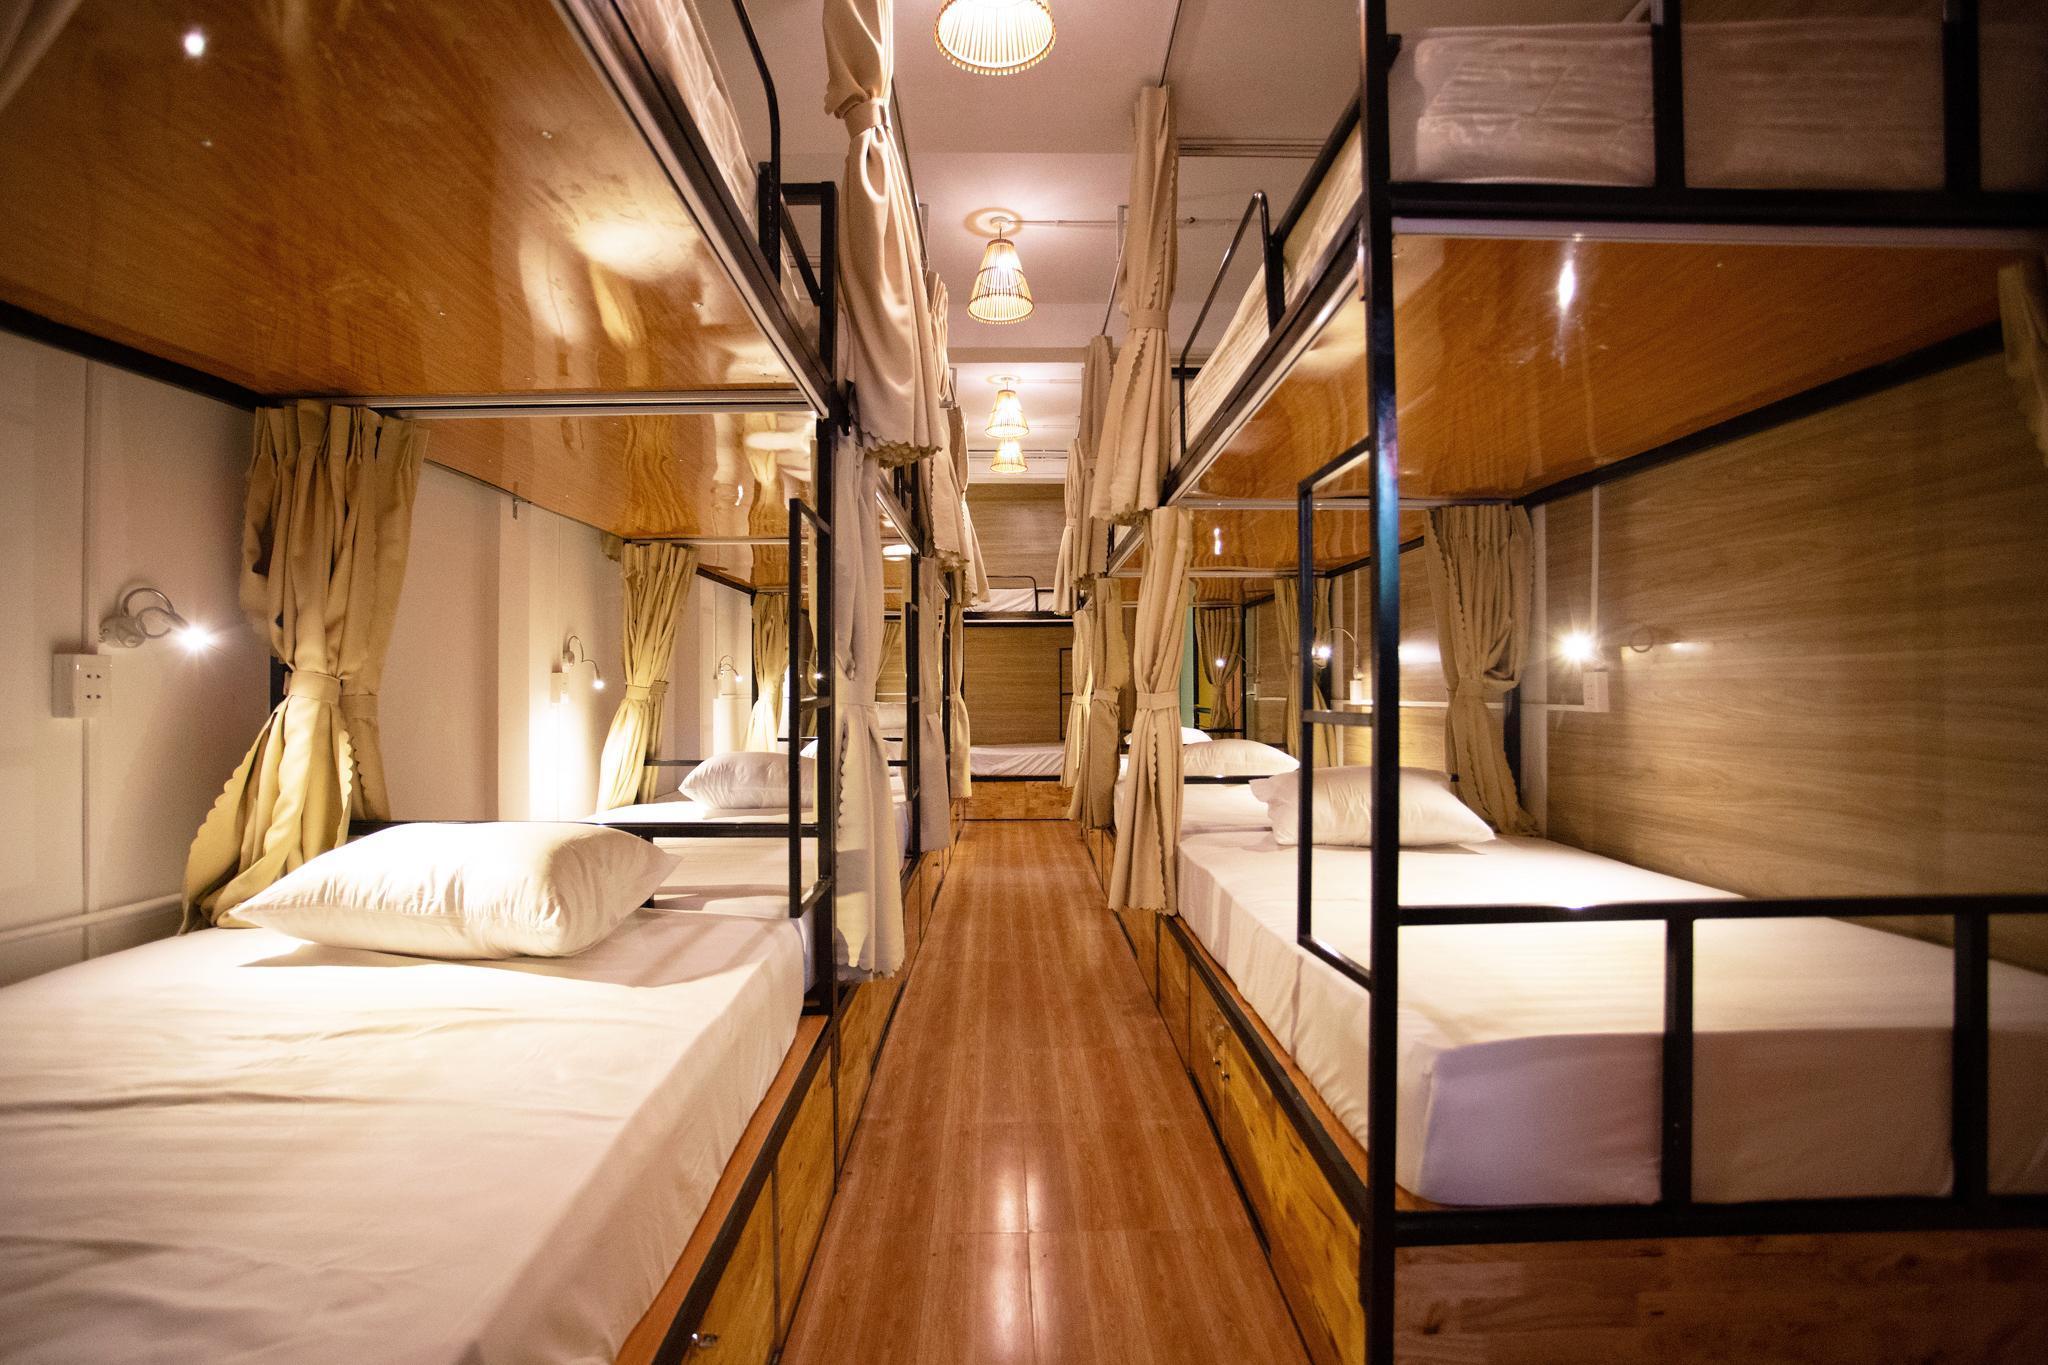 POSIKI Dorm Hostel